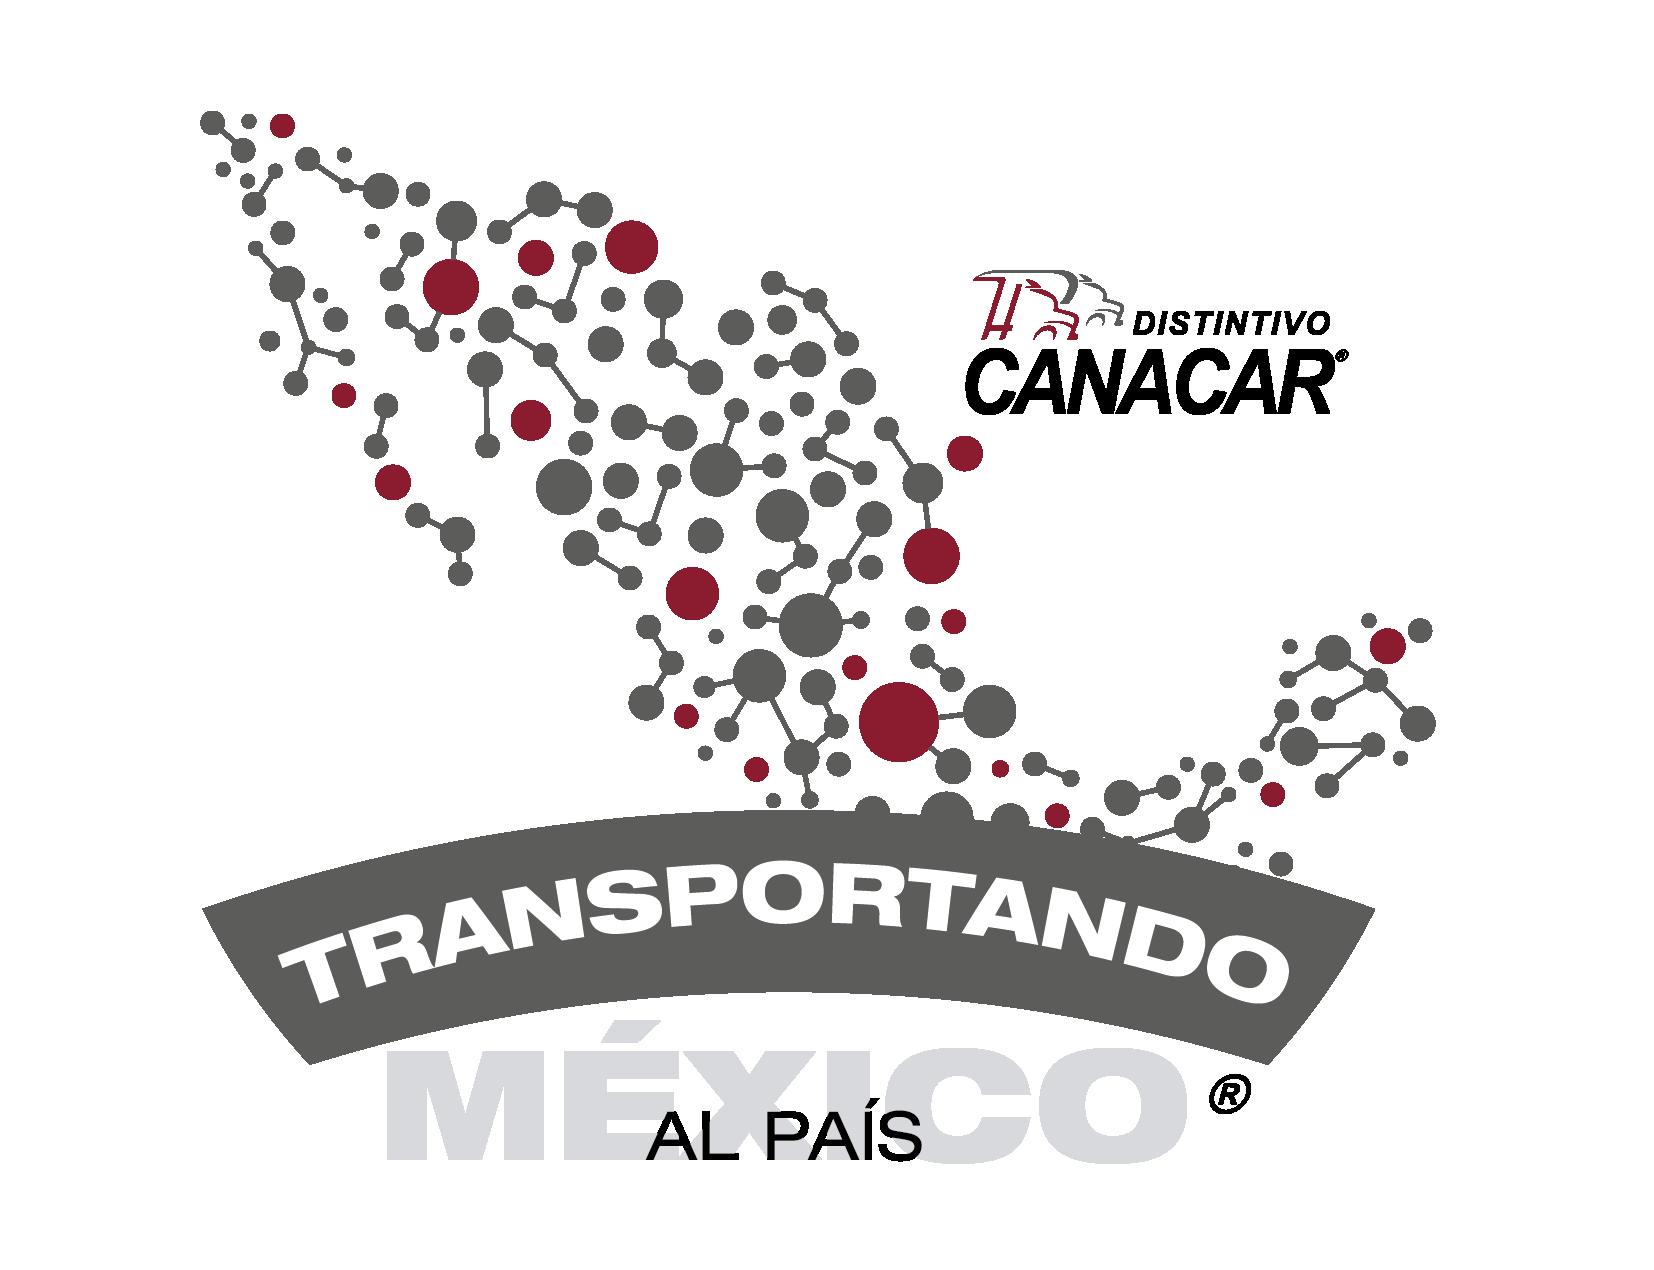 canacar-logo